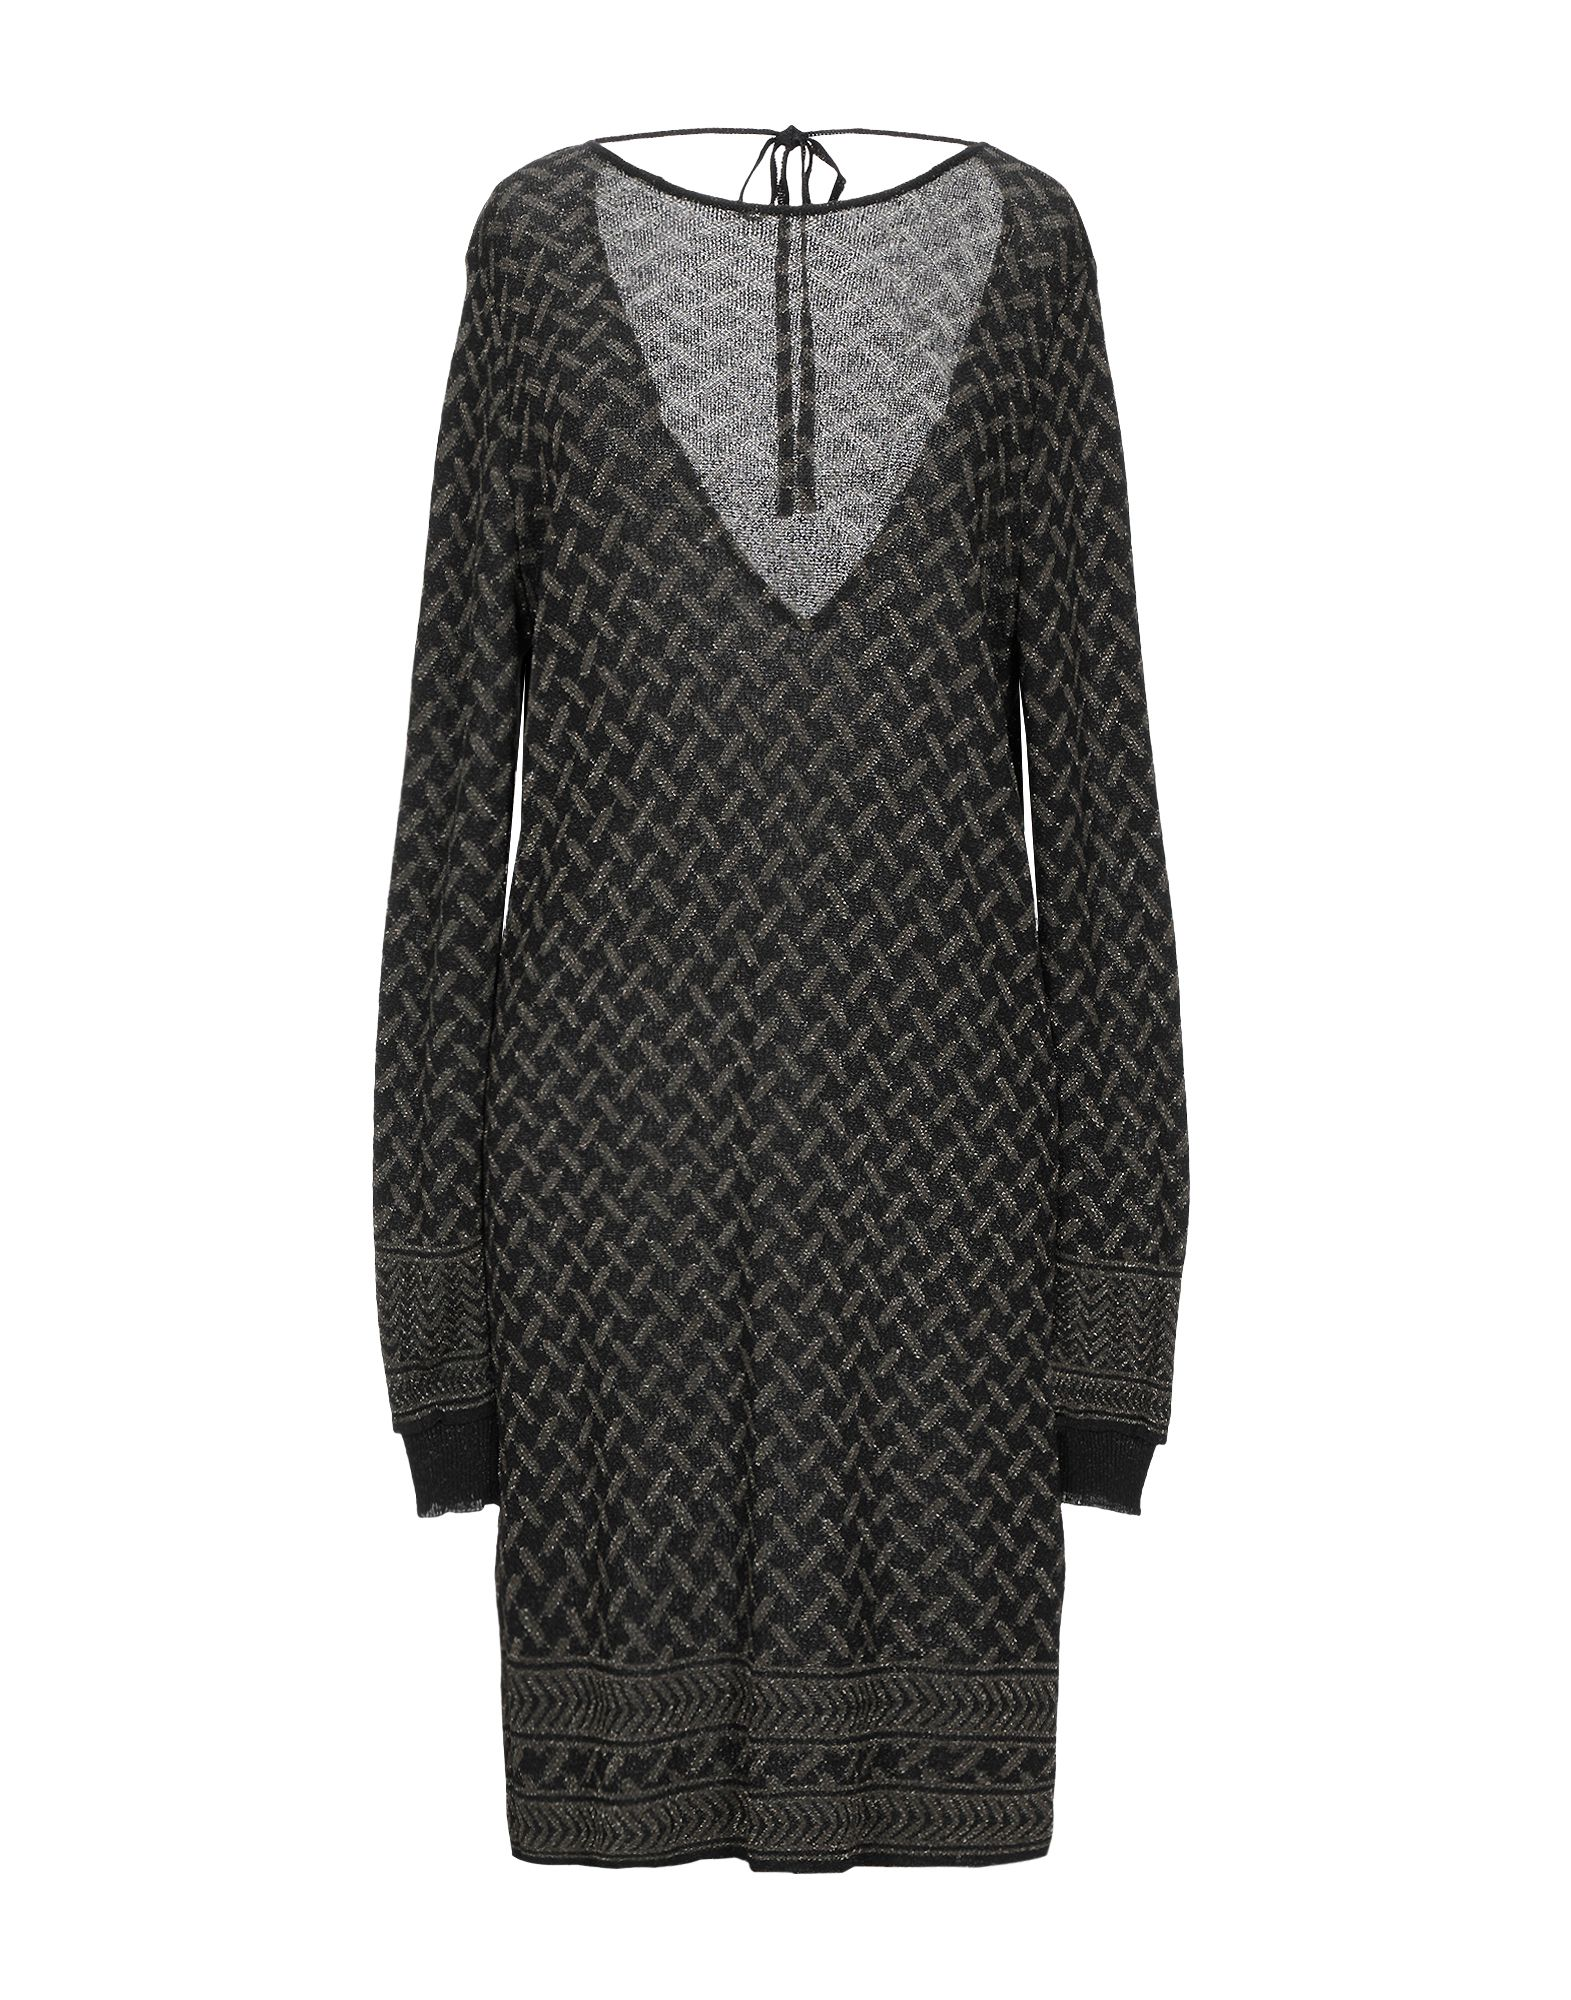 LALA BERLIN Короткое платье lala berlin юбка до колена